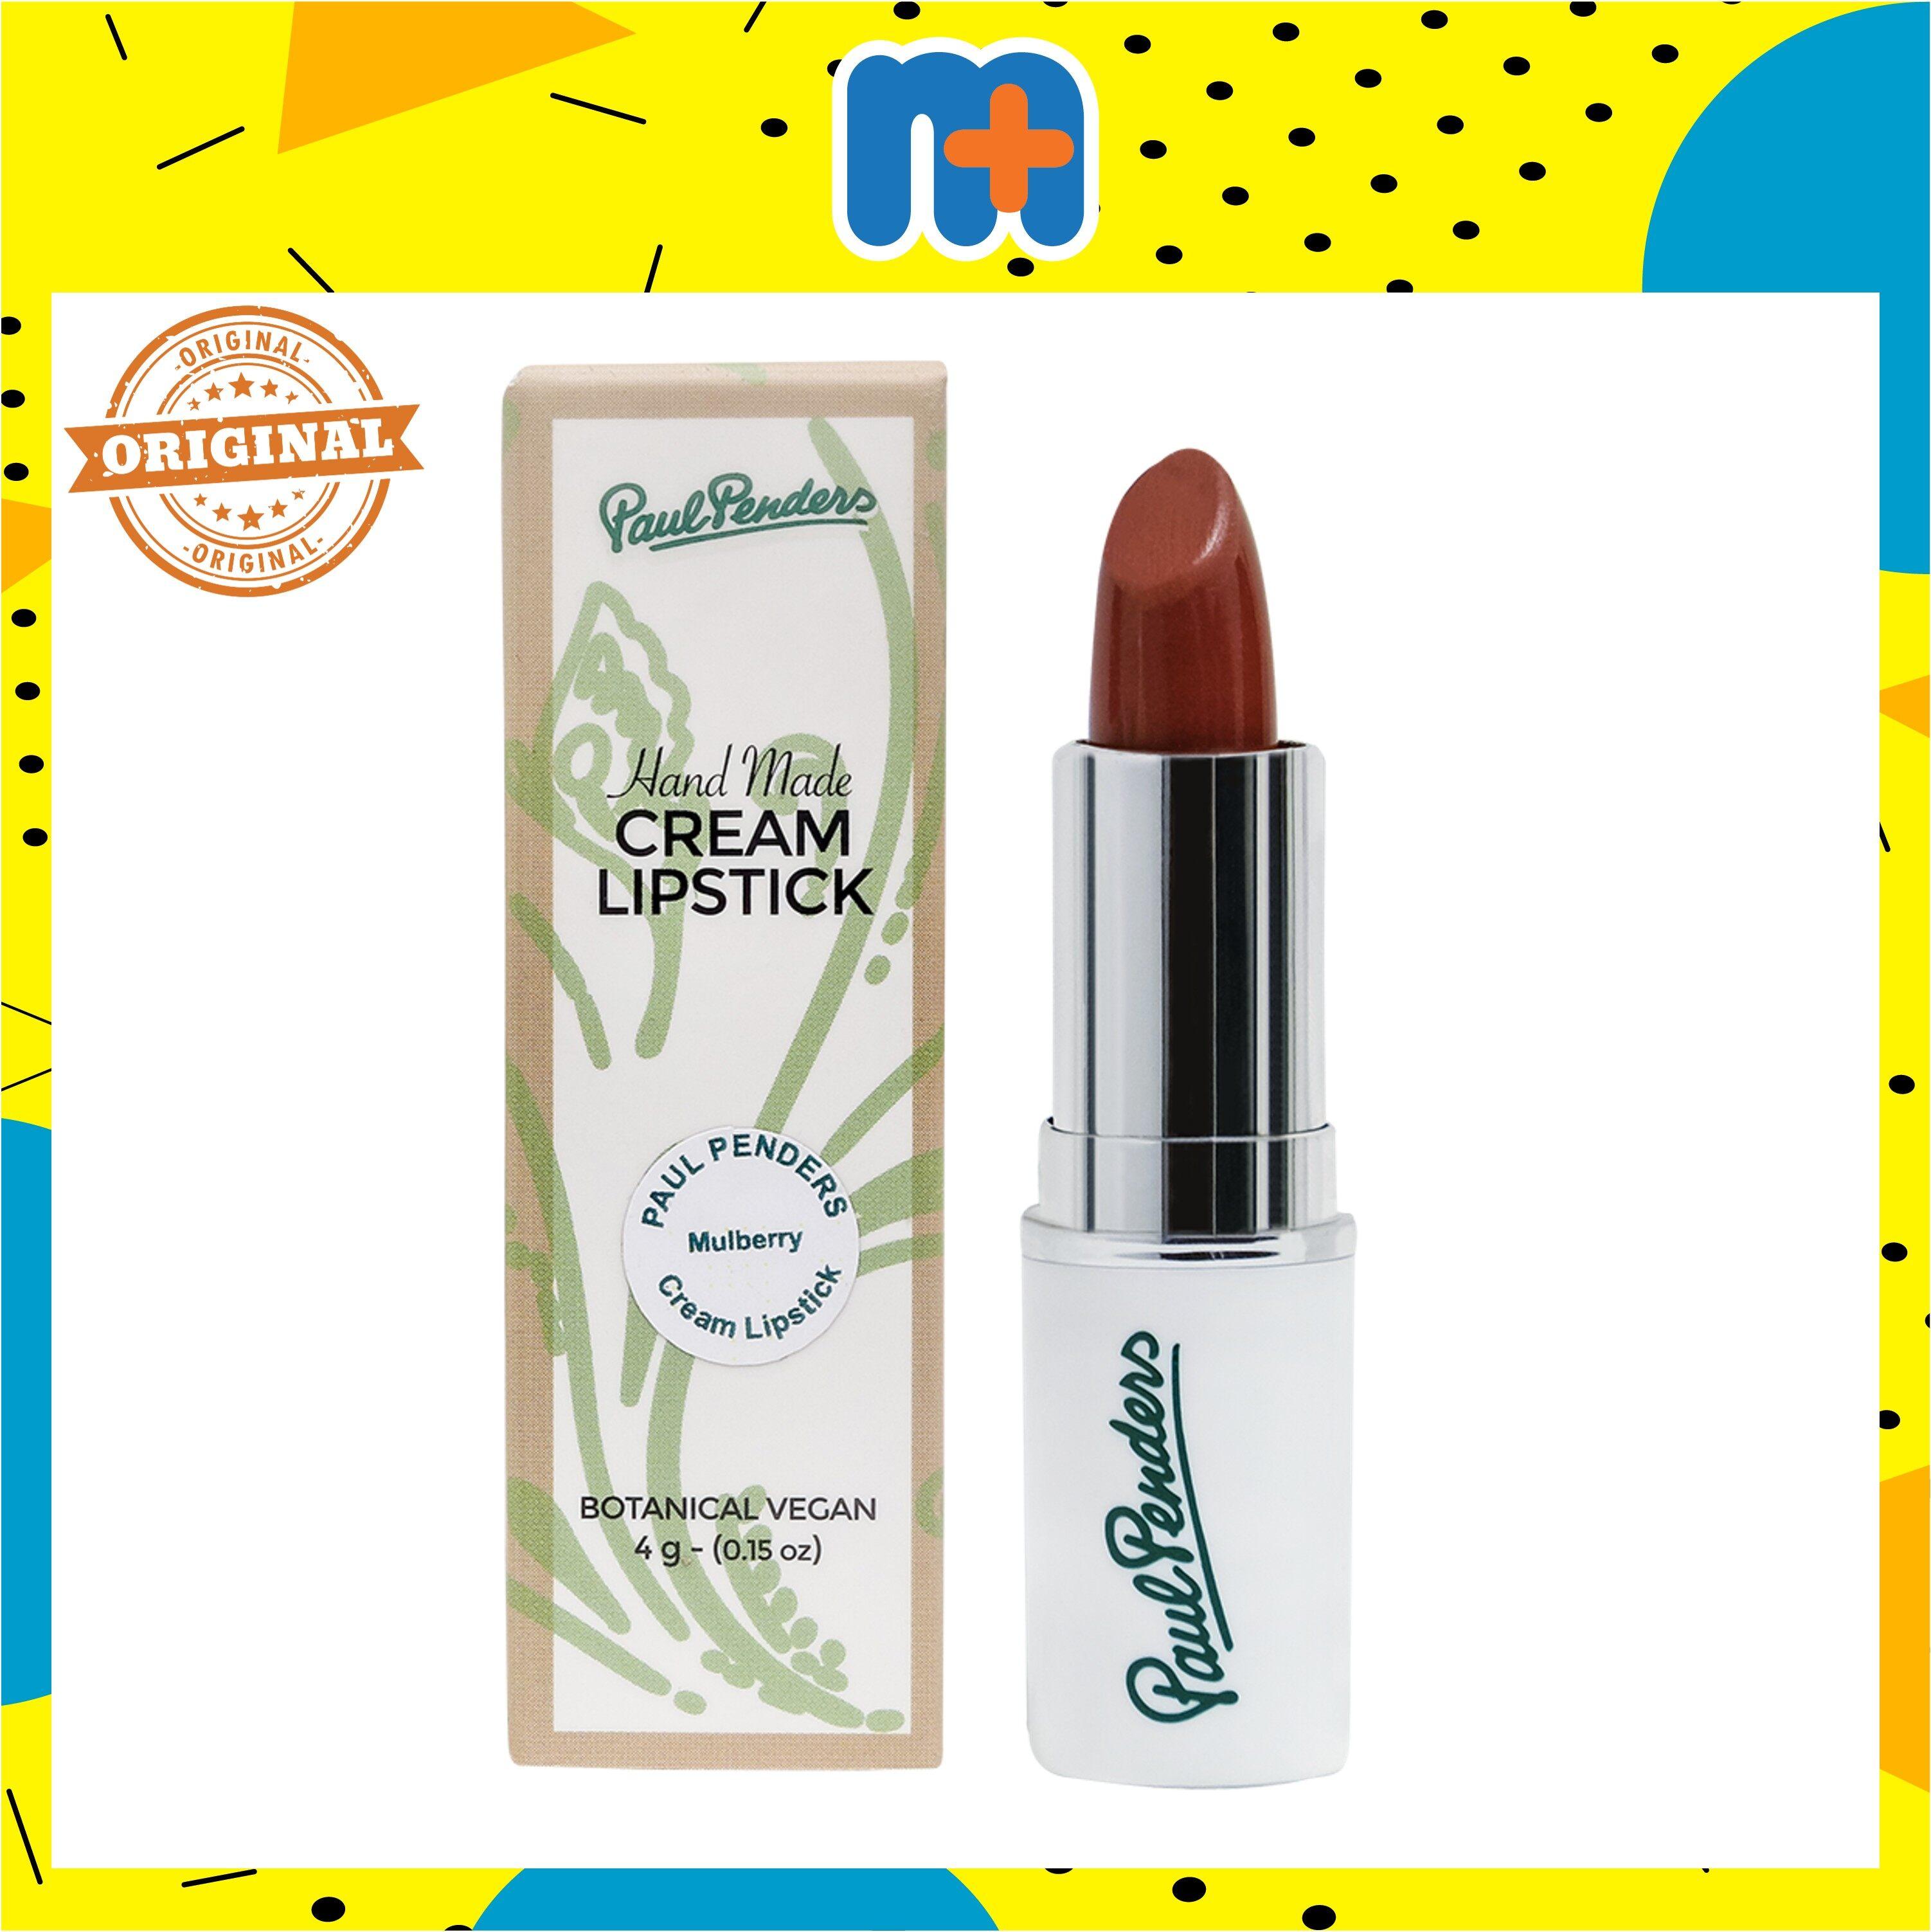 [MPLUS] PAUL PENDERS HANDMADE CREAM LIPSTICK MULBERRY 4G lipstick